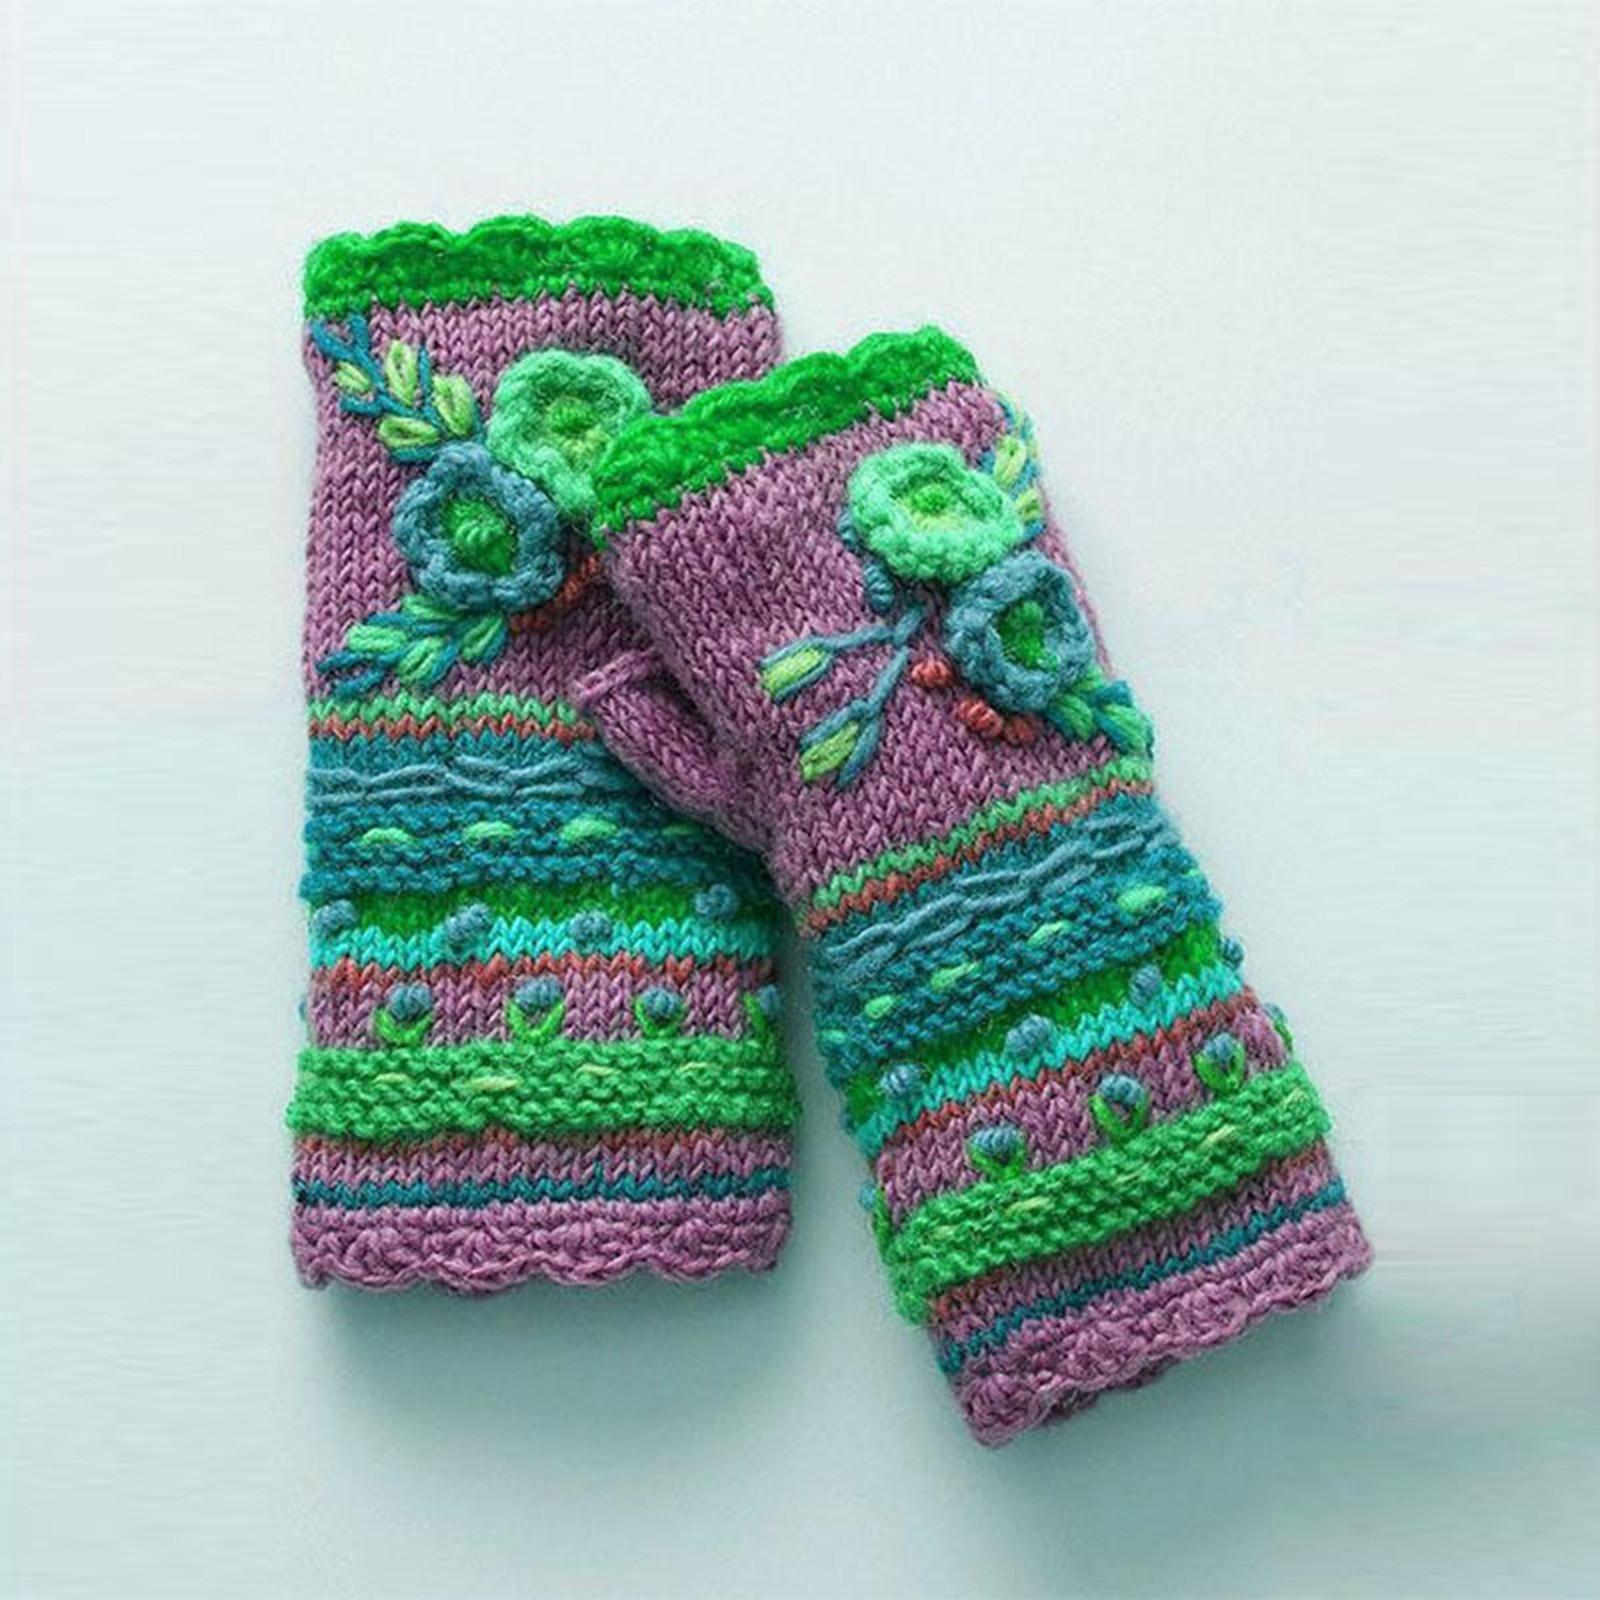 Womens Winter Warm Gloves Flower Knitted Fingerless Gloves Crochet Handwarmers Glove Mittens Without Fingers Cashmere Mittens